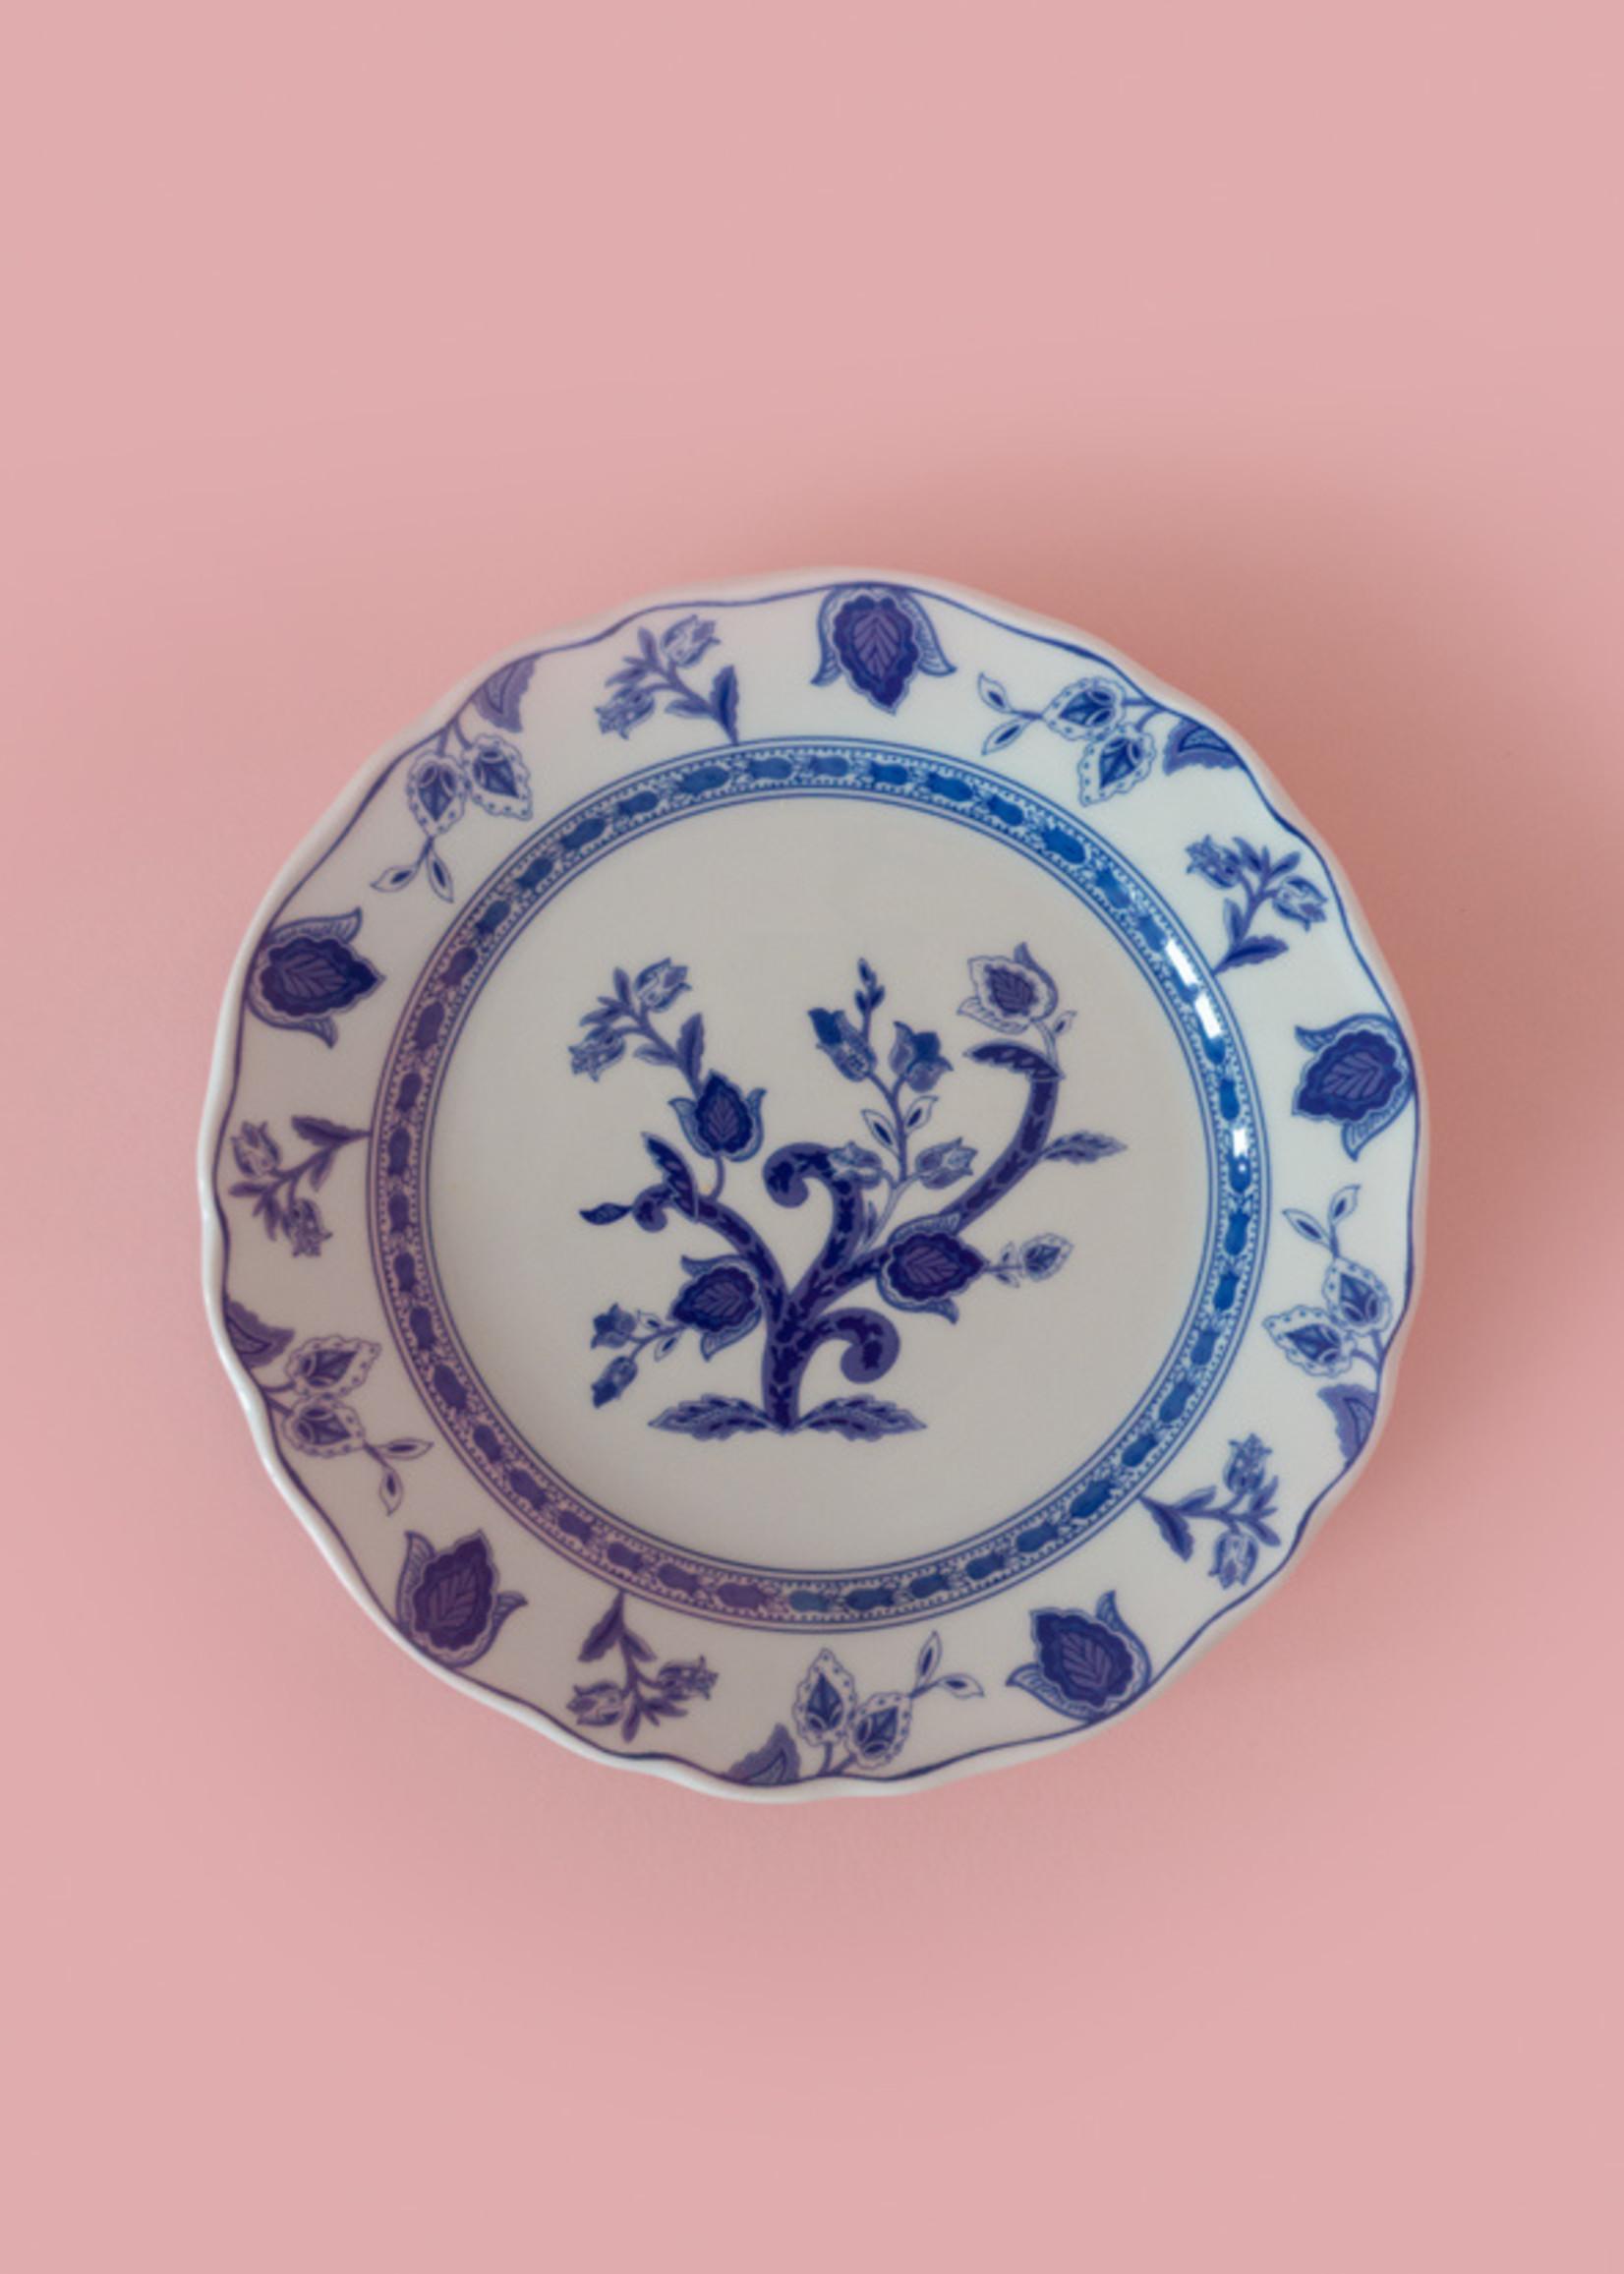 Estheréa's breakfast plate from Maria's Bar